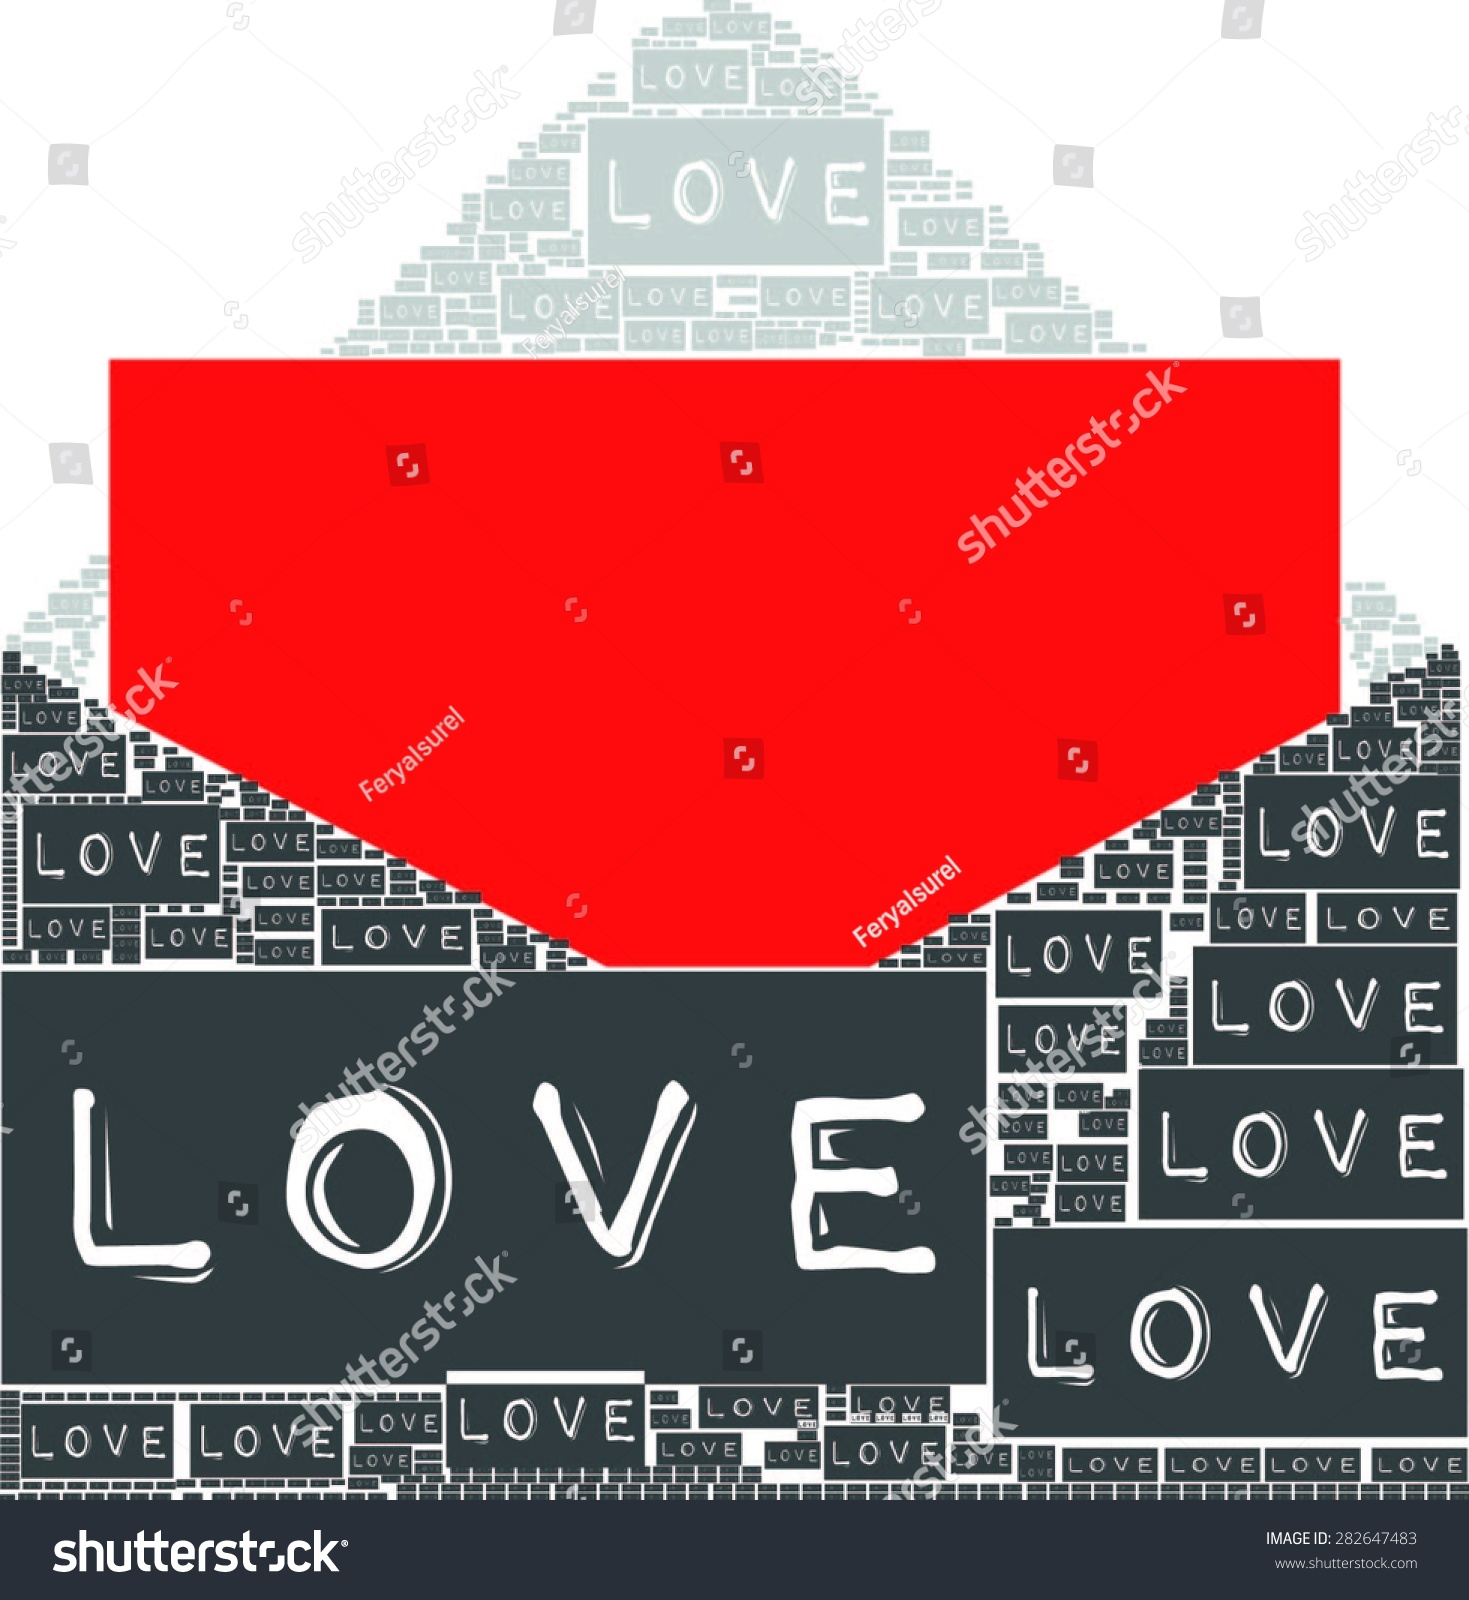 Shirt design envelope - Love Letters Become Envelope Design And Red Paper Letter Together Vector Print Pattern For T